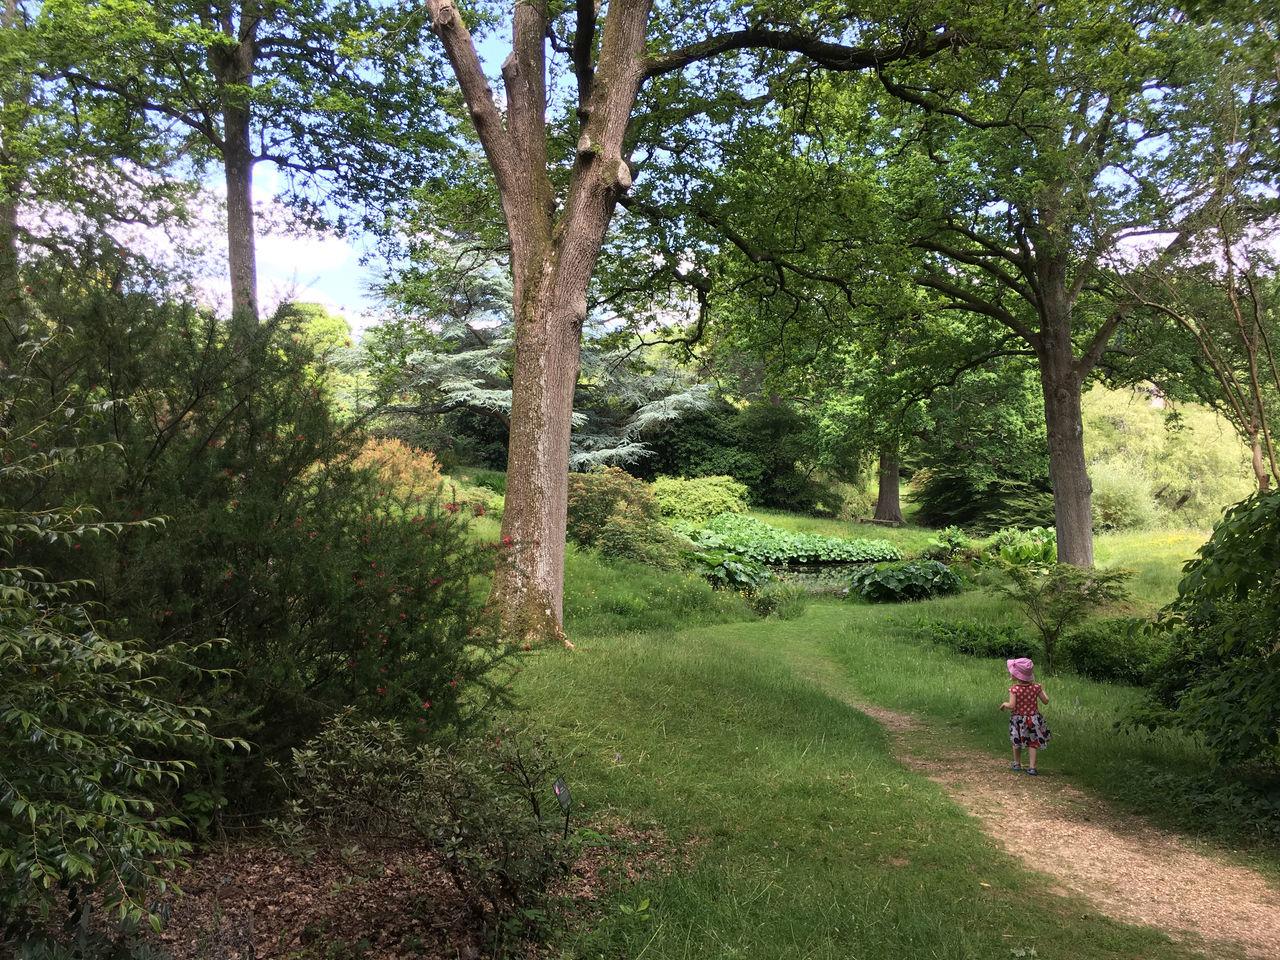 Little Girl Outdoors Park Path Tree